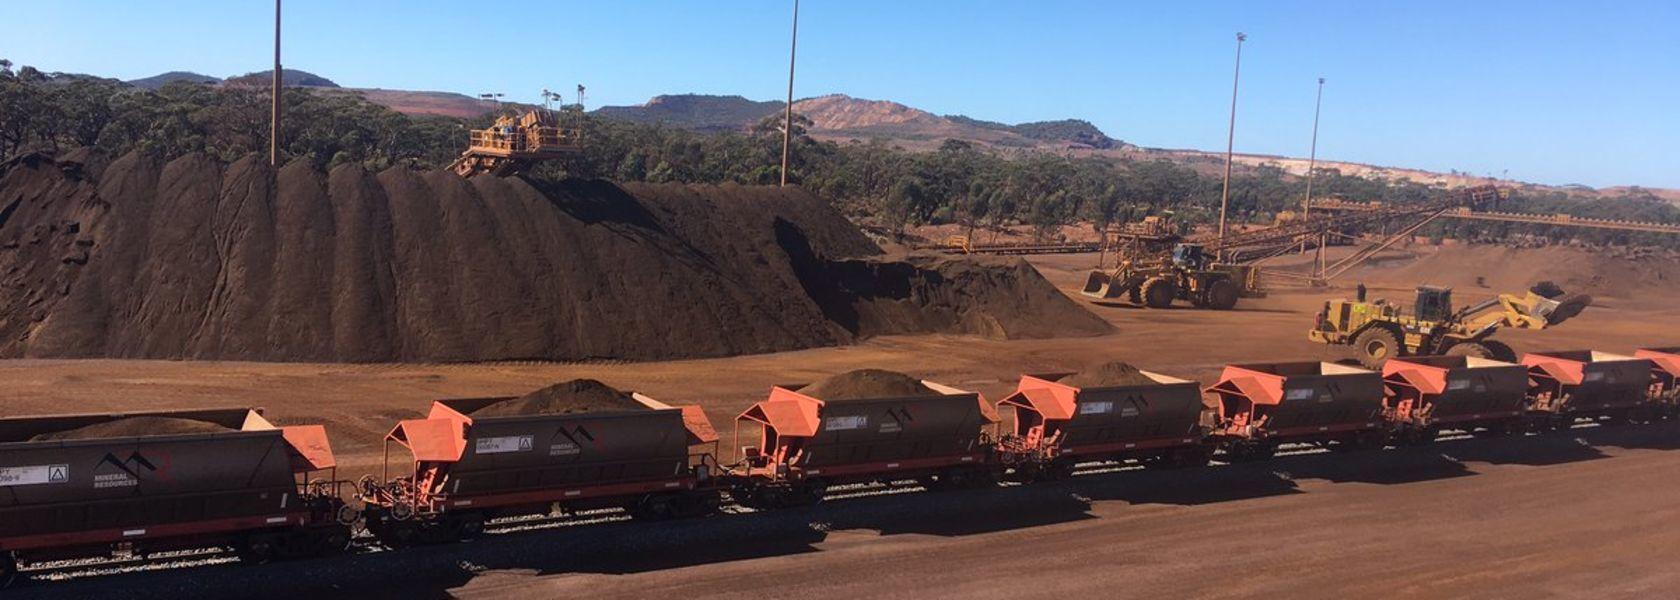 Second iron ore train derails in Western Australia - Mining Magazine